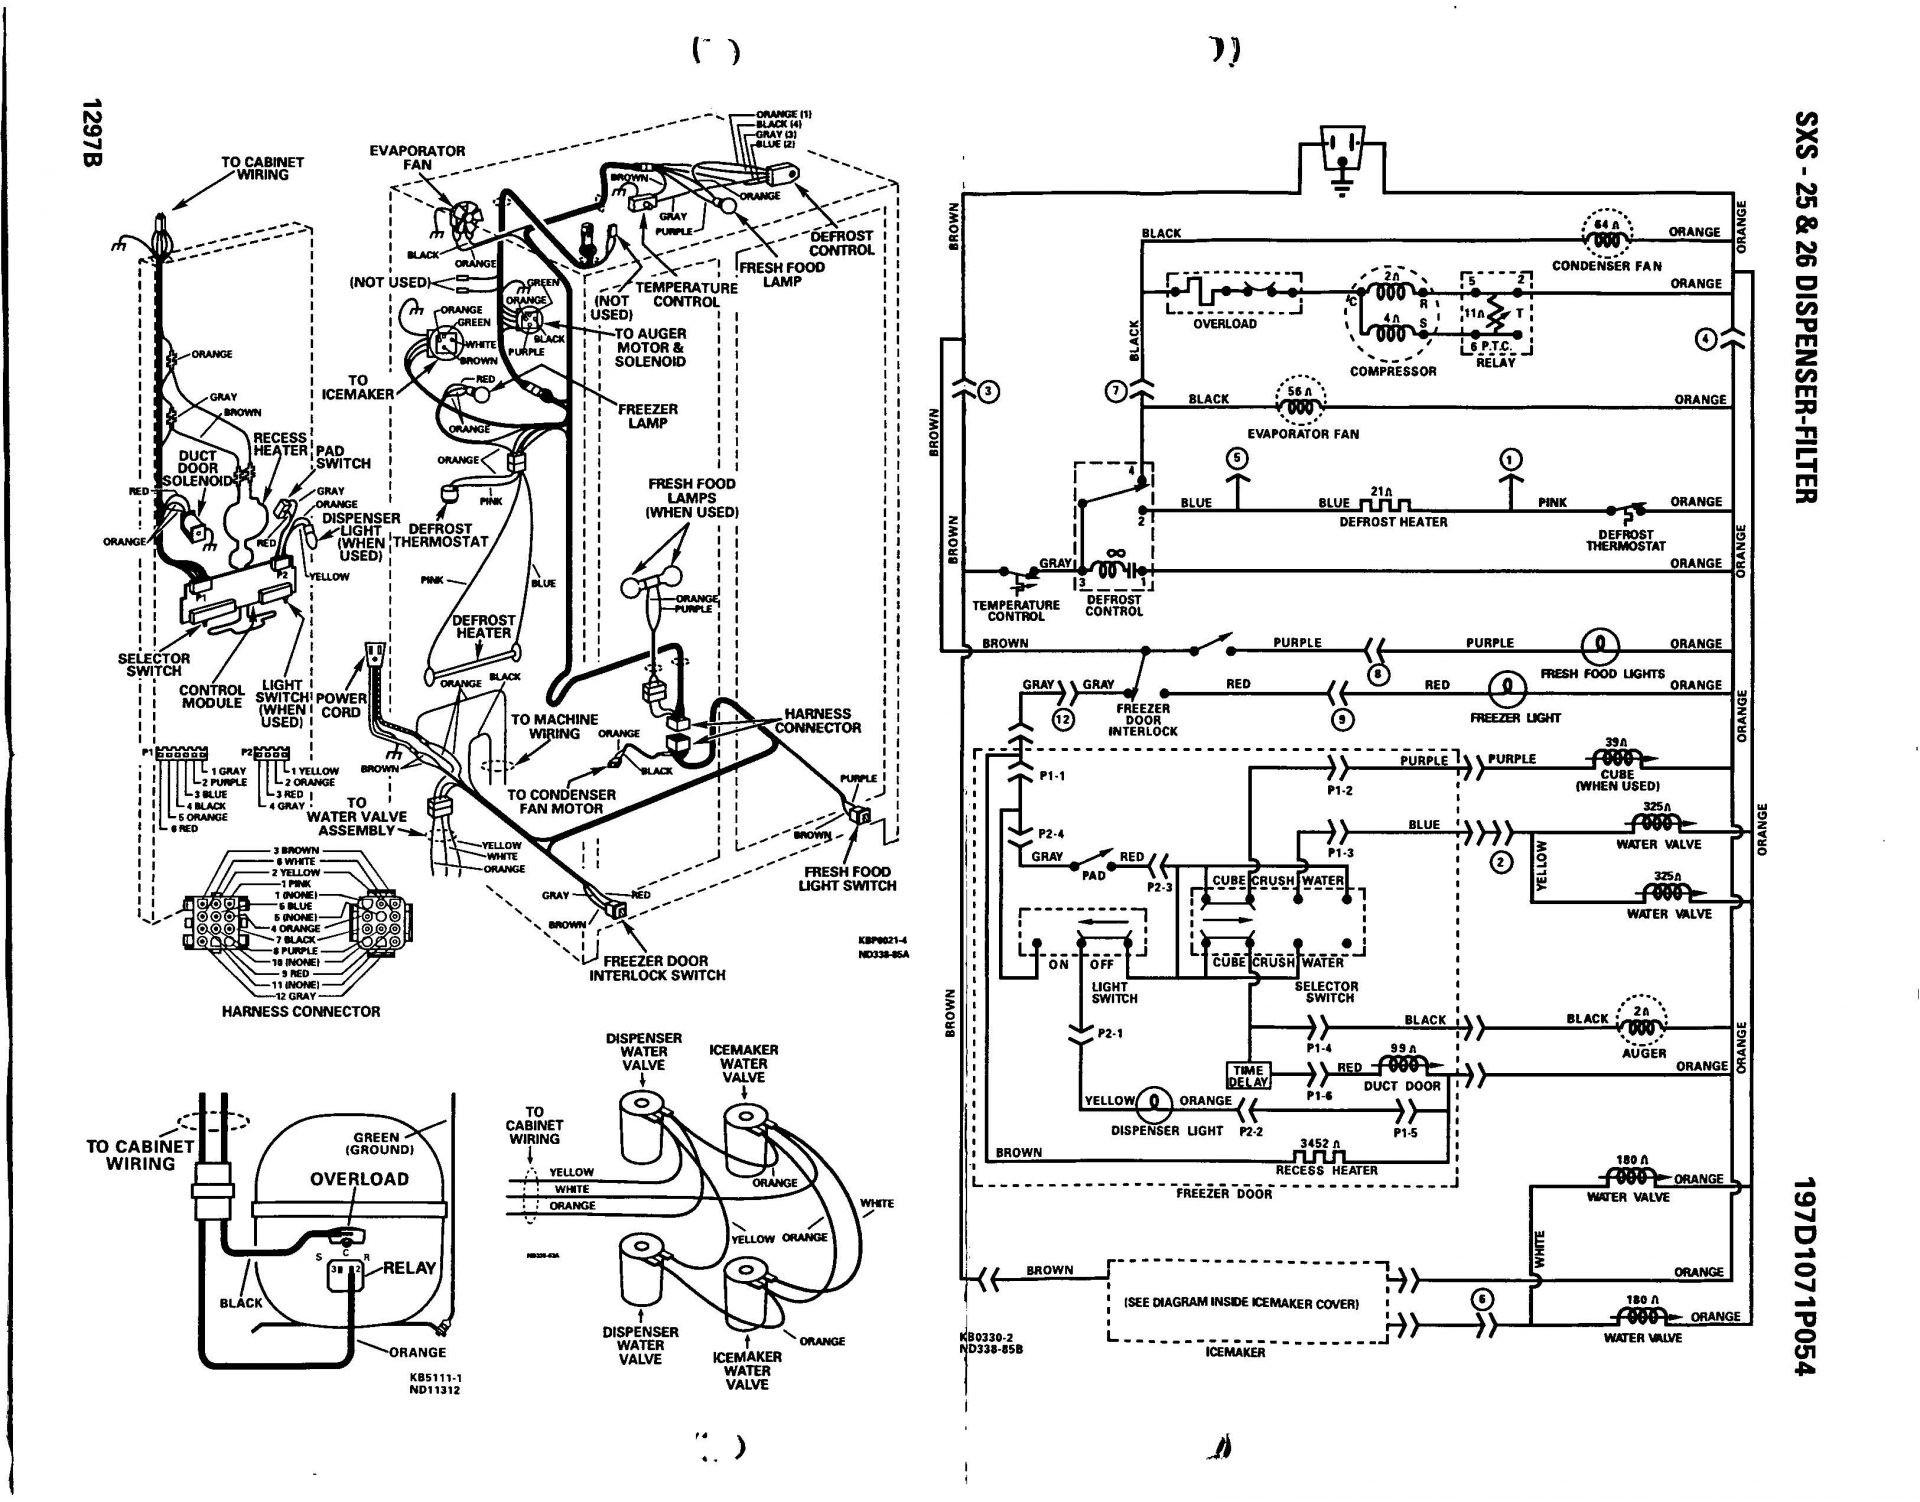 Ge Wiring Diagrams Refrigerator Diagram Side By Refrigerators Throughout In For Kenmore Dryer Motor